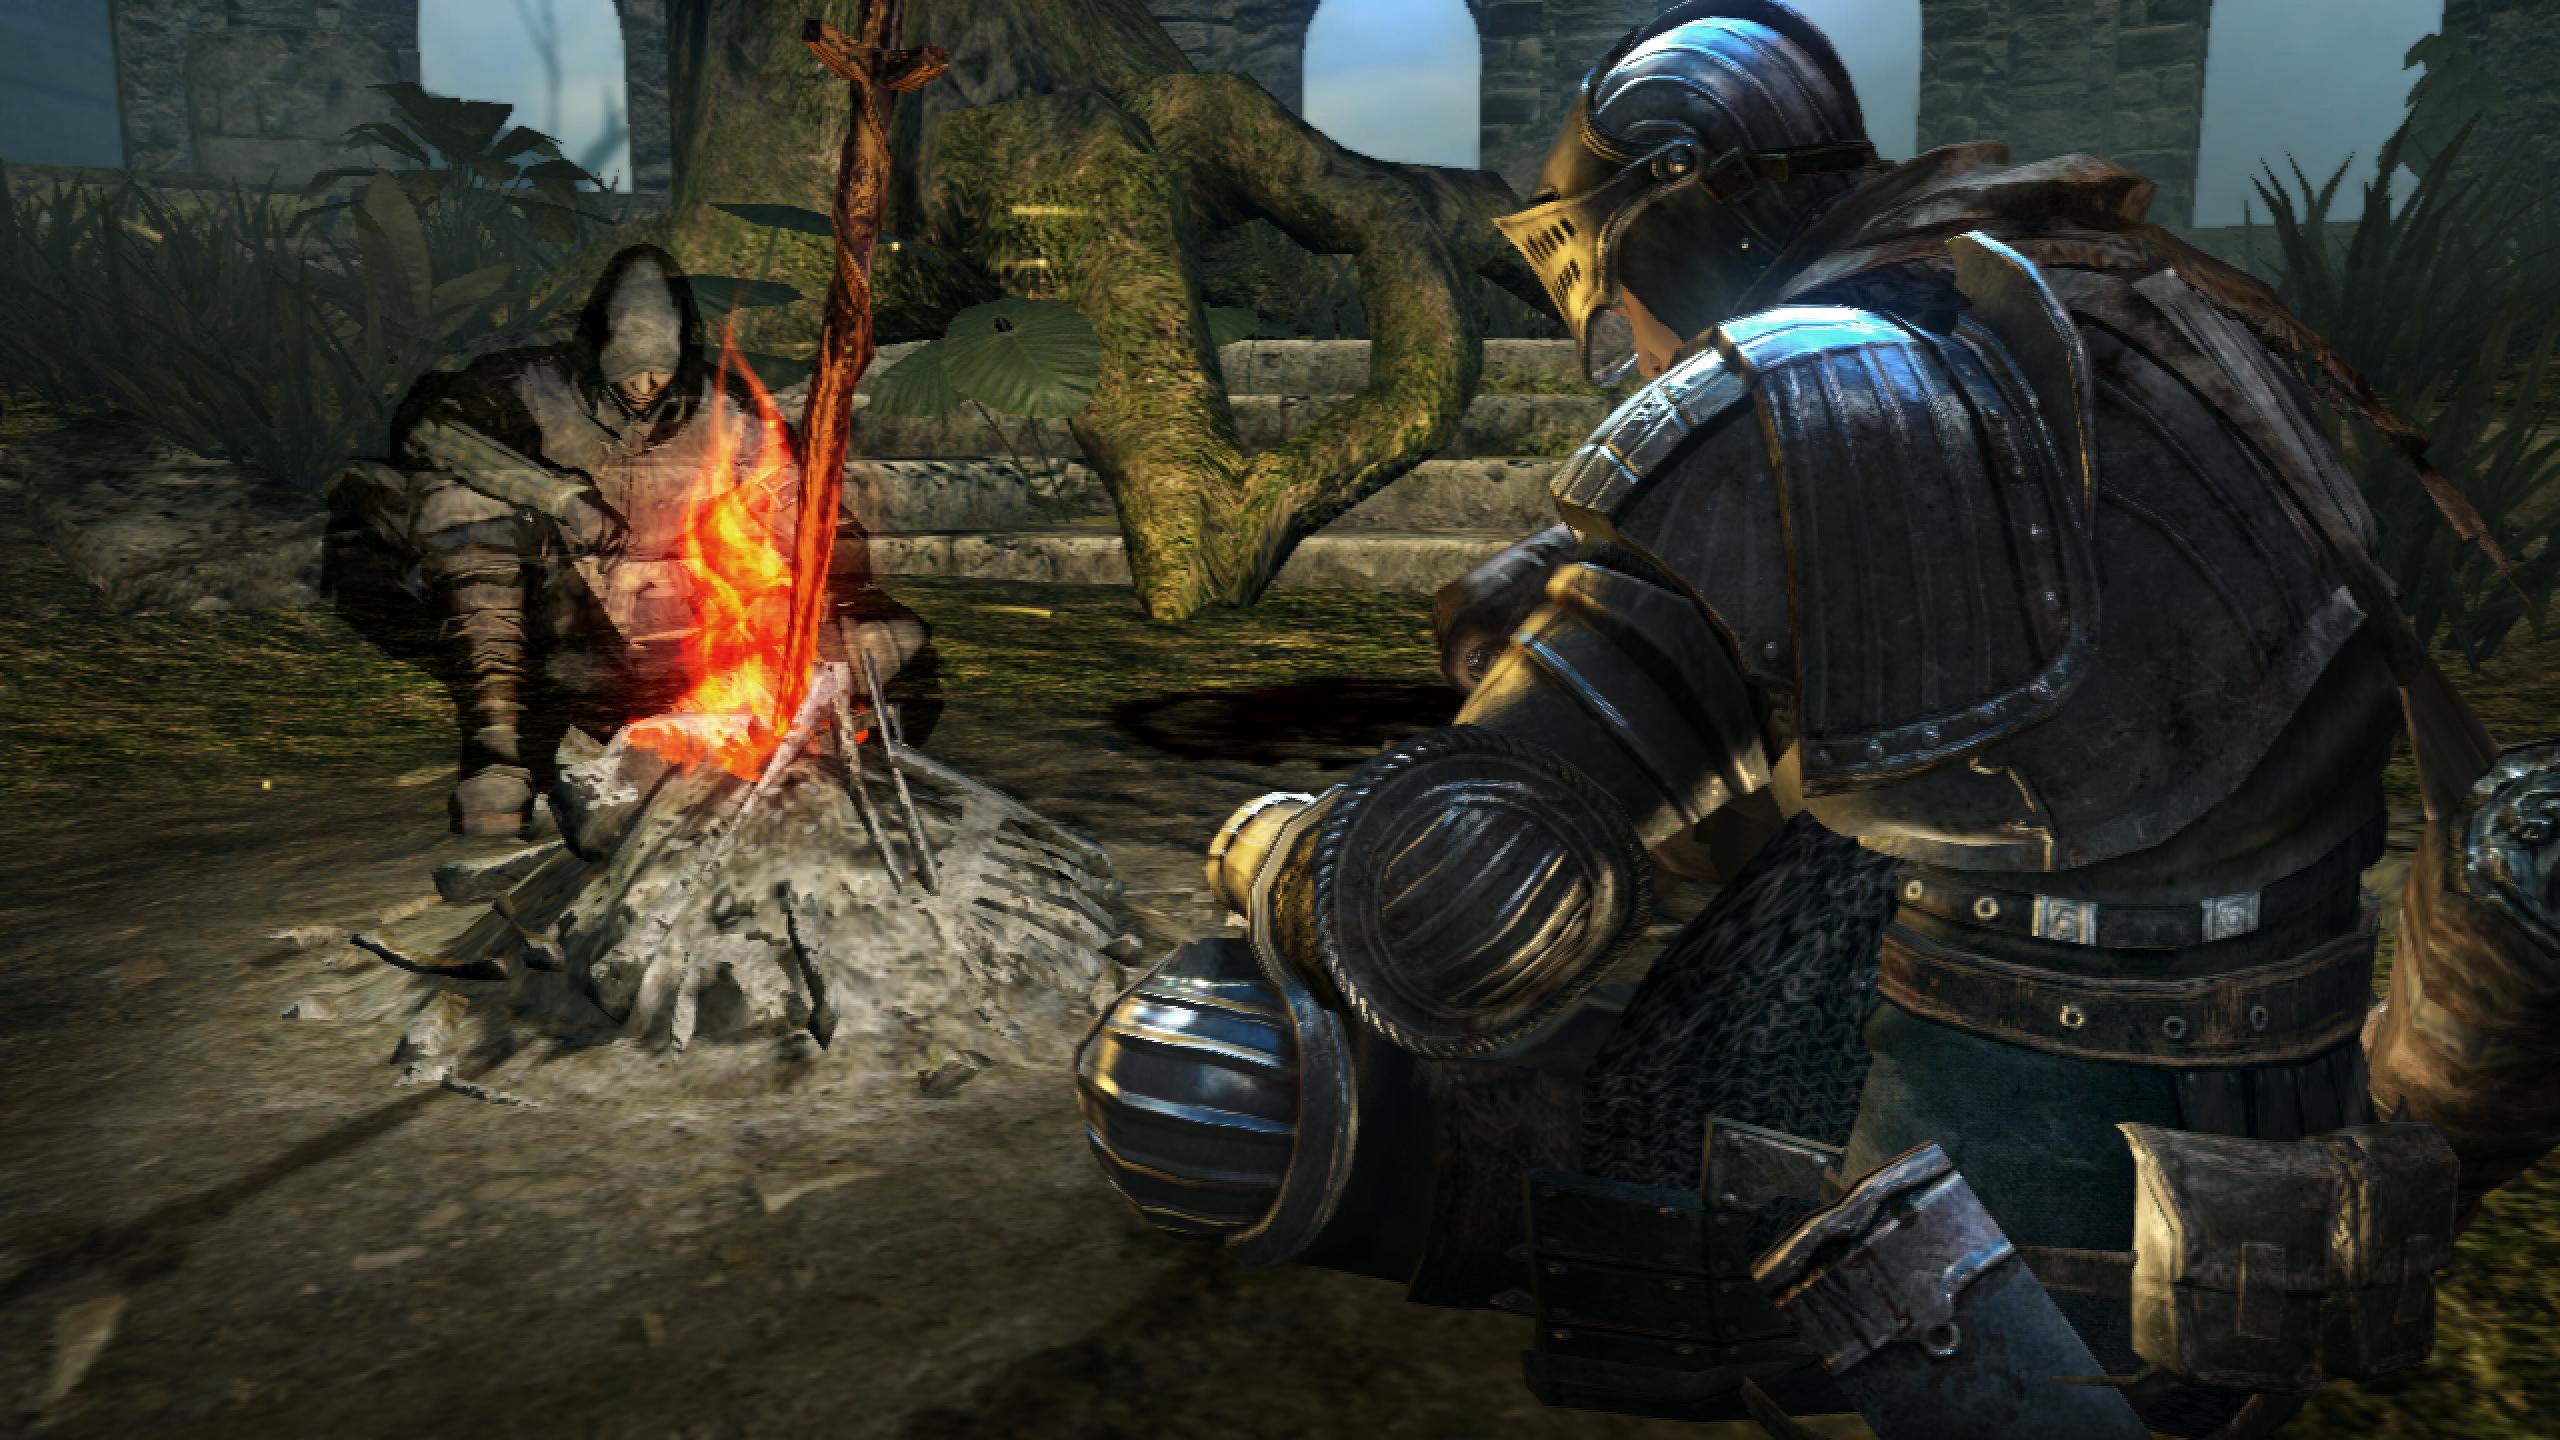 GameBanshee - Games - Dark Souls